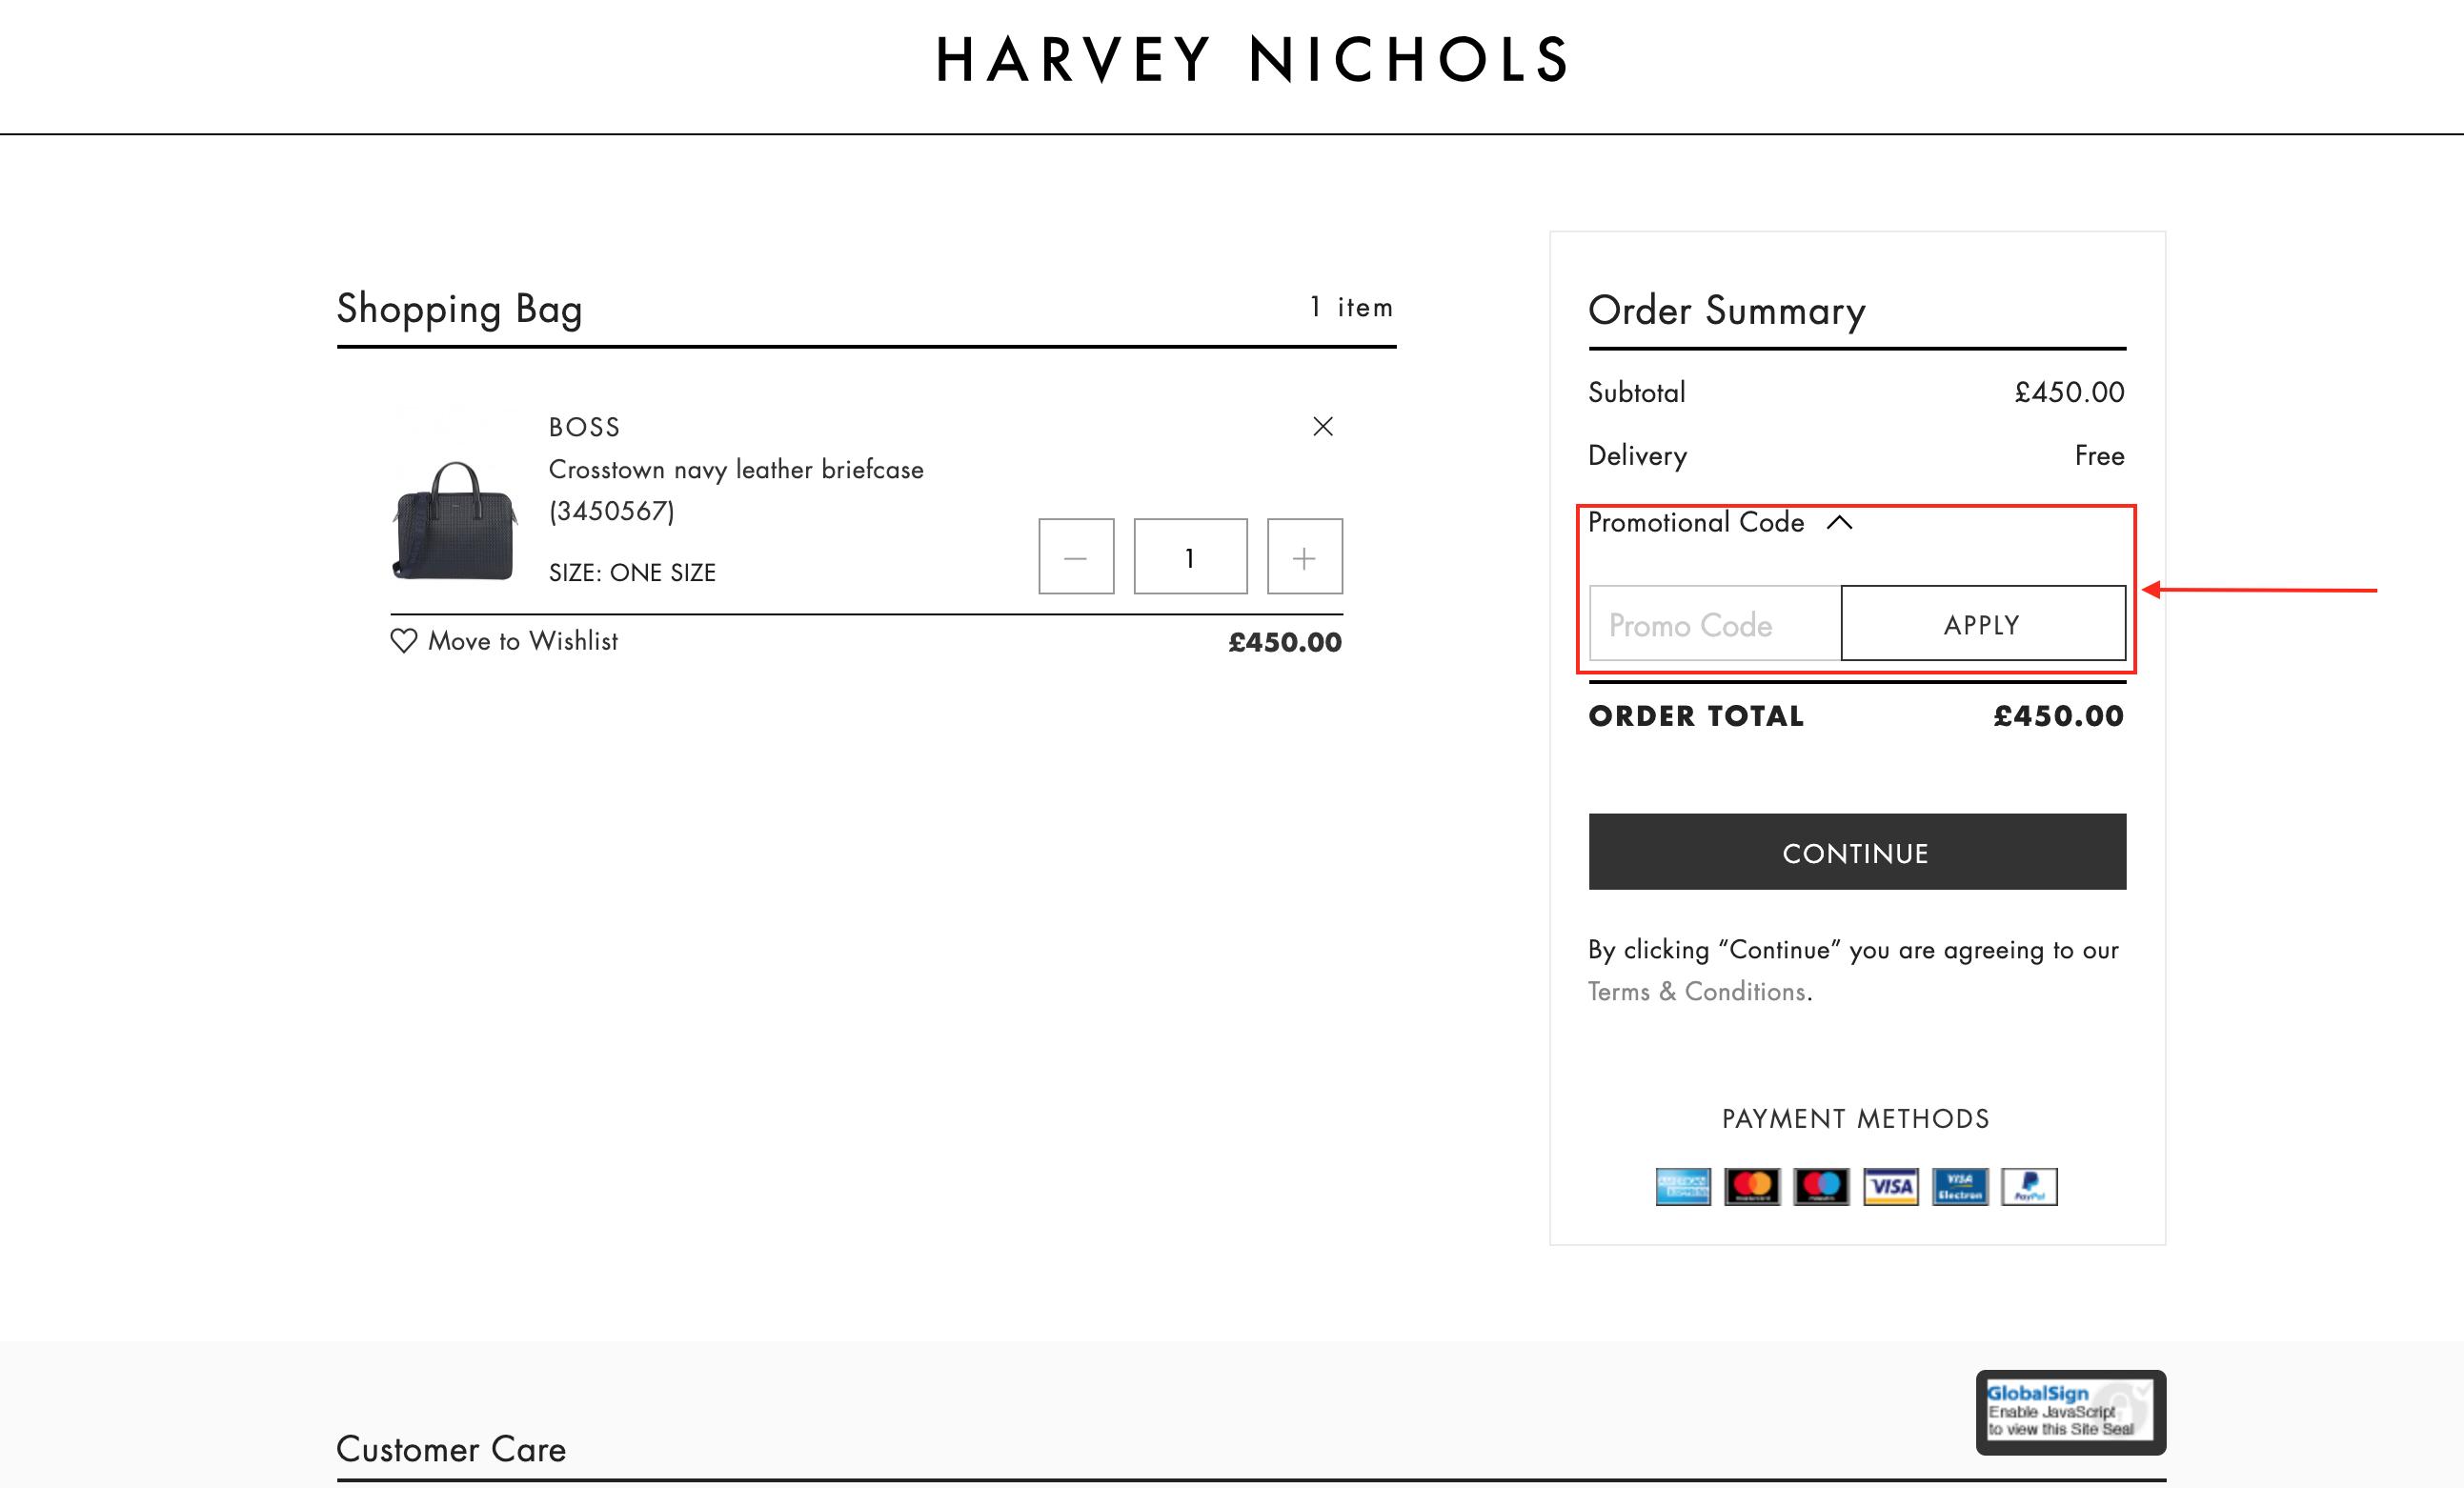 harvey nichols-voucher_redemption-how-to